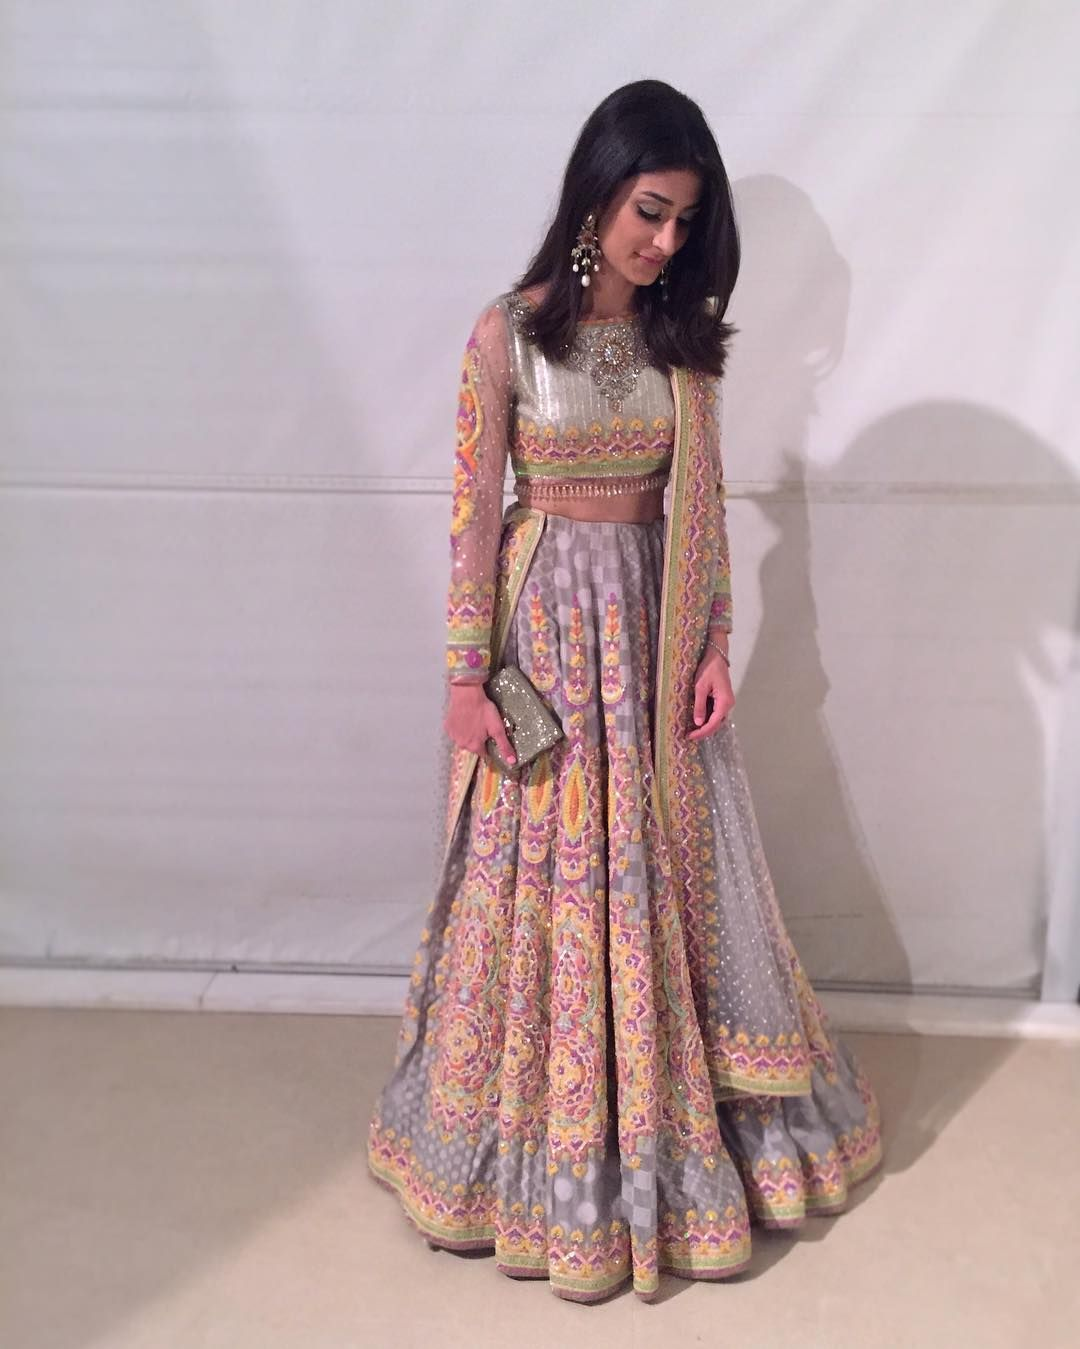 Pinterest Krutichevli Lehenga Dresses Saree Pinterest Indian Outfits Desi And